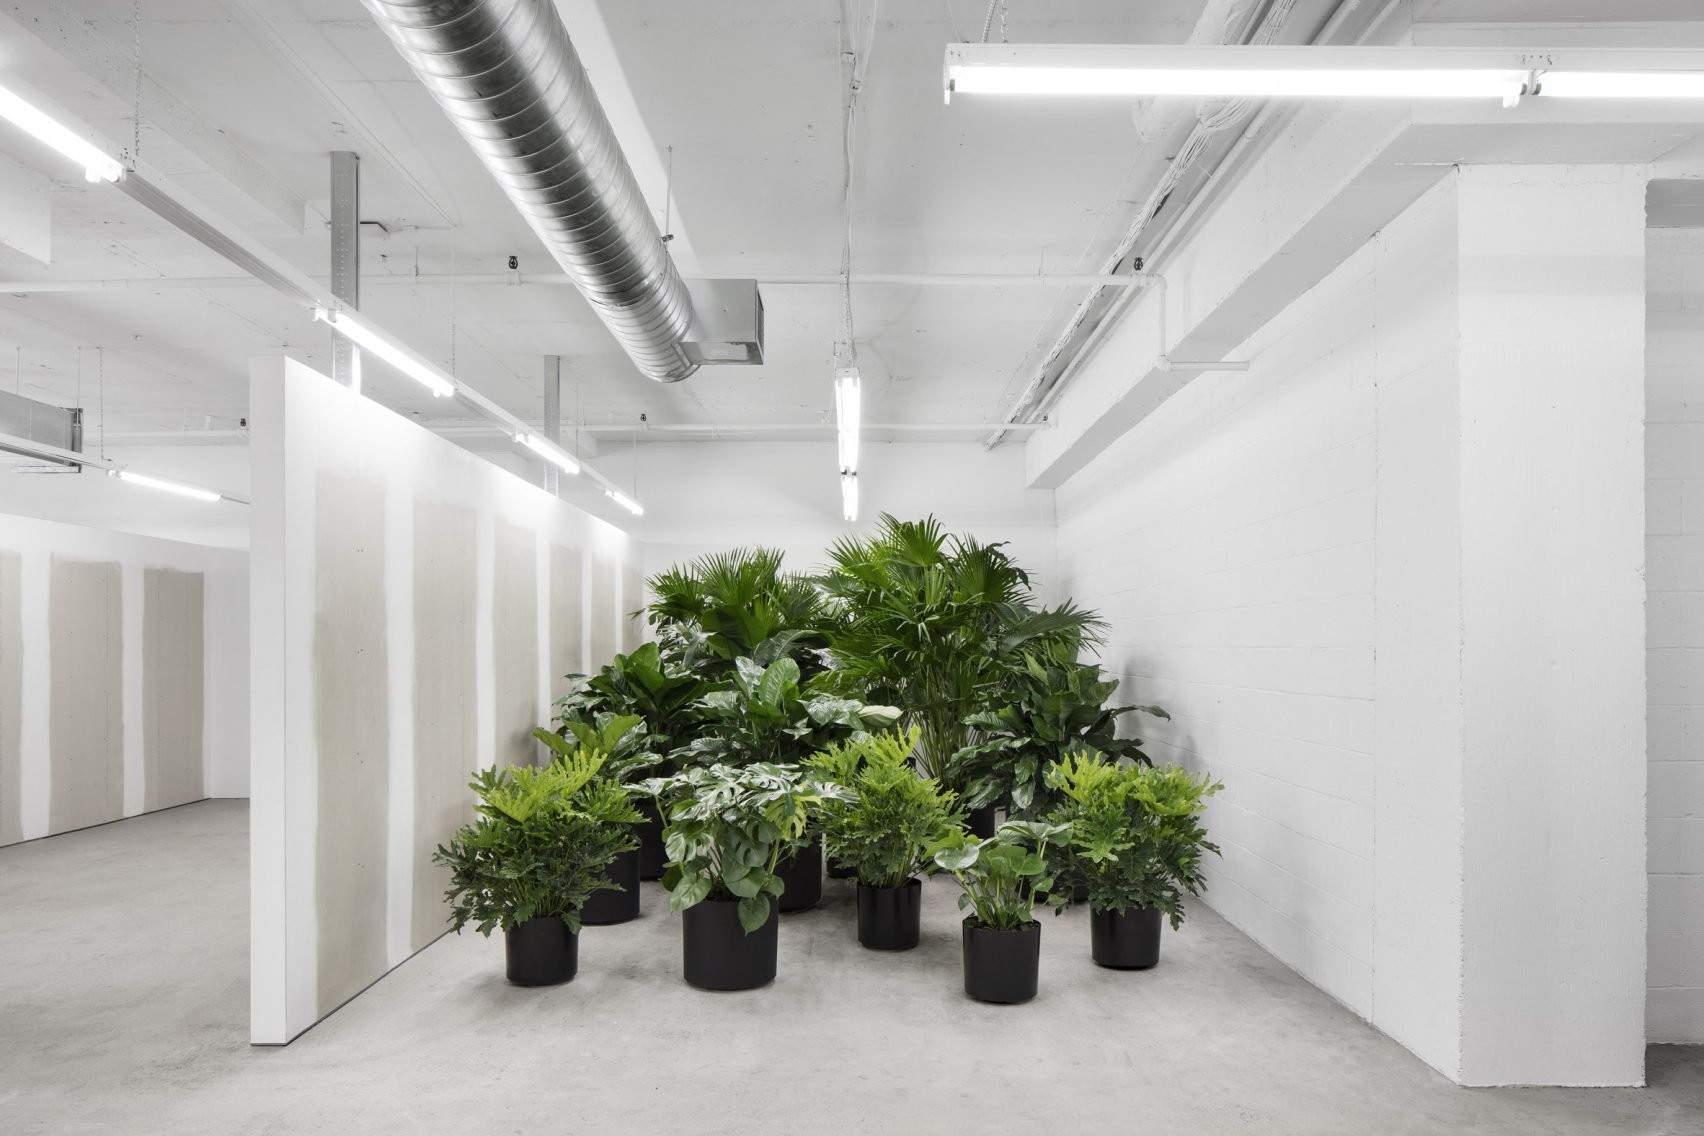 ssense-atelier-barda-offices-interiors-montreal-canada-_dezeen_2364_col_7-1704x1136.jpg